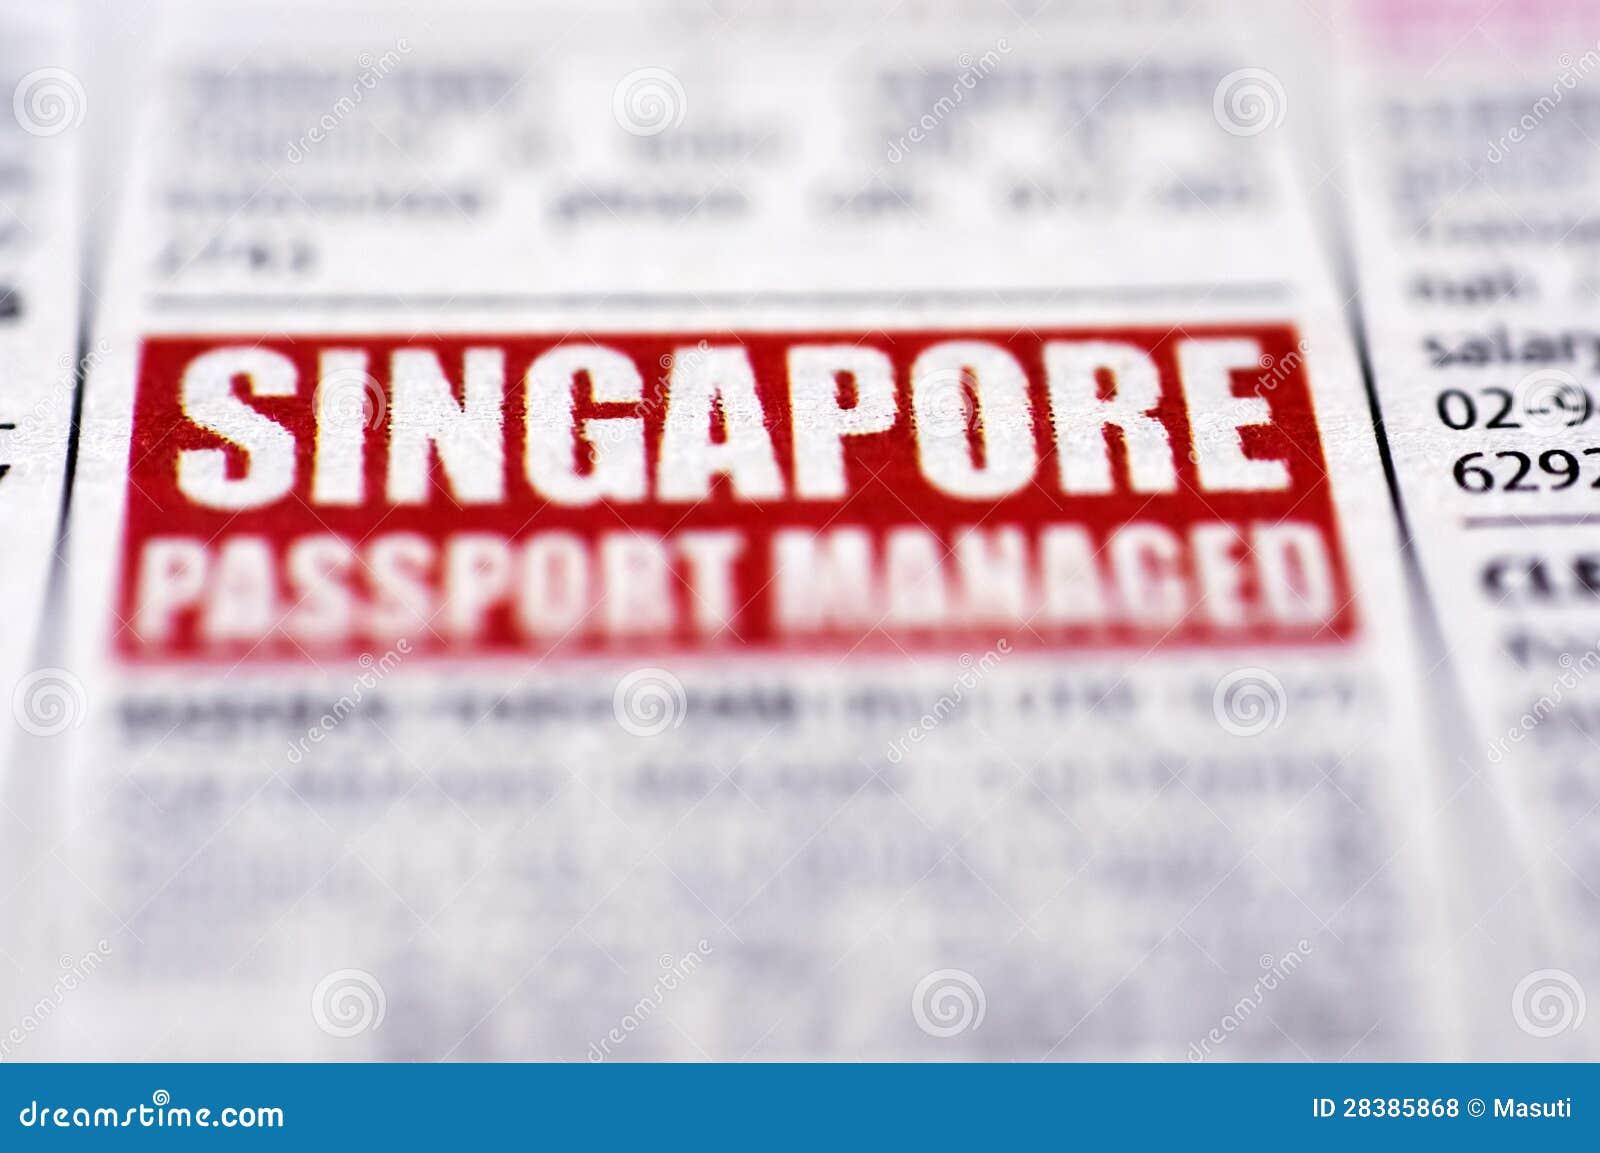 Job vacancy casino singapore - Colusa casino graciela beltran 39cacef7eaf5